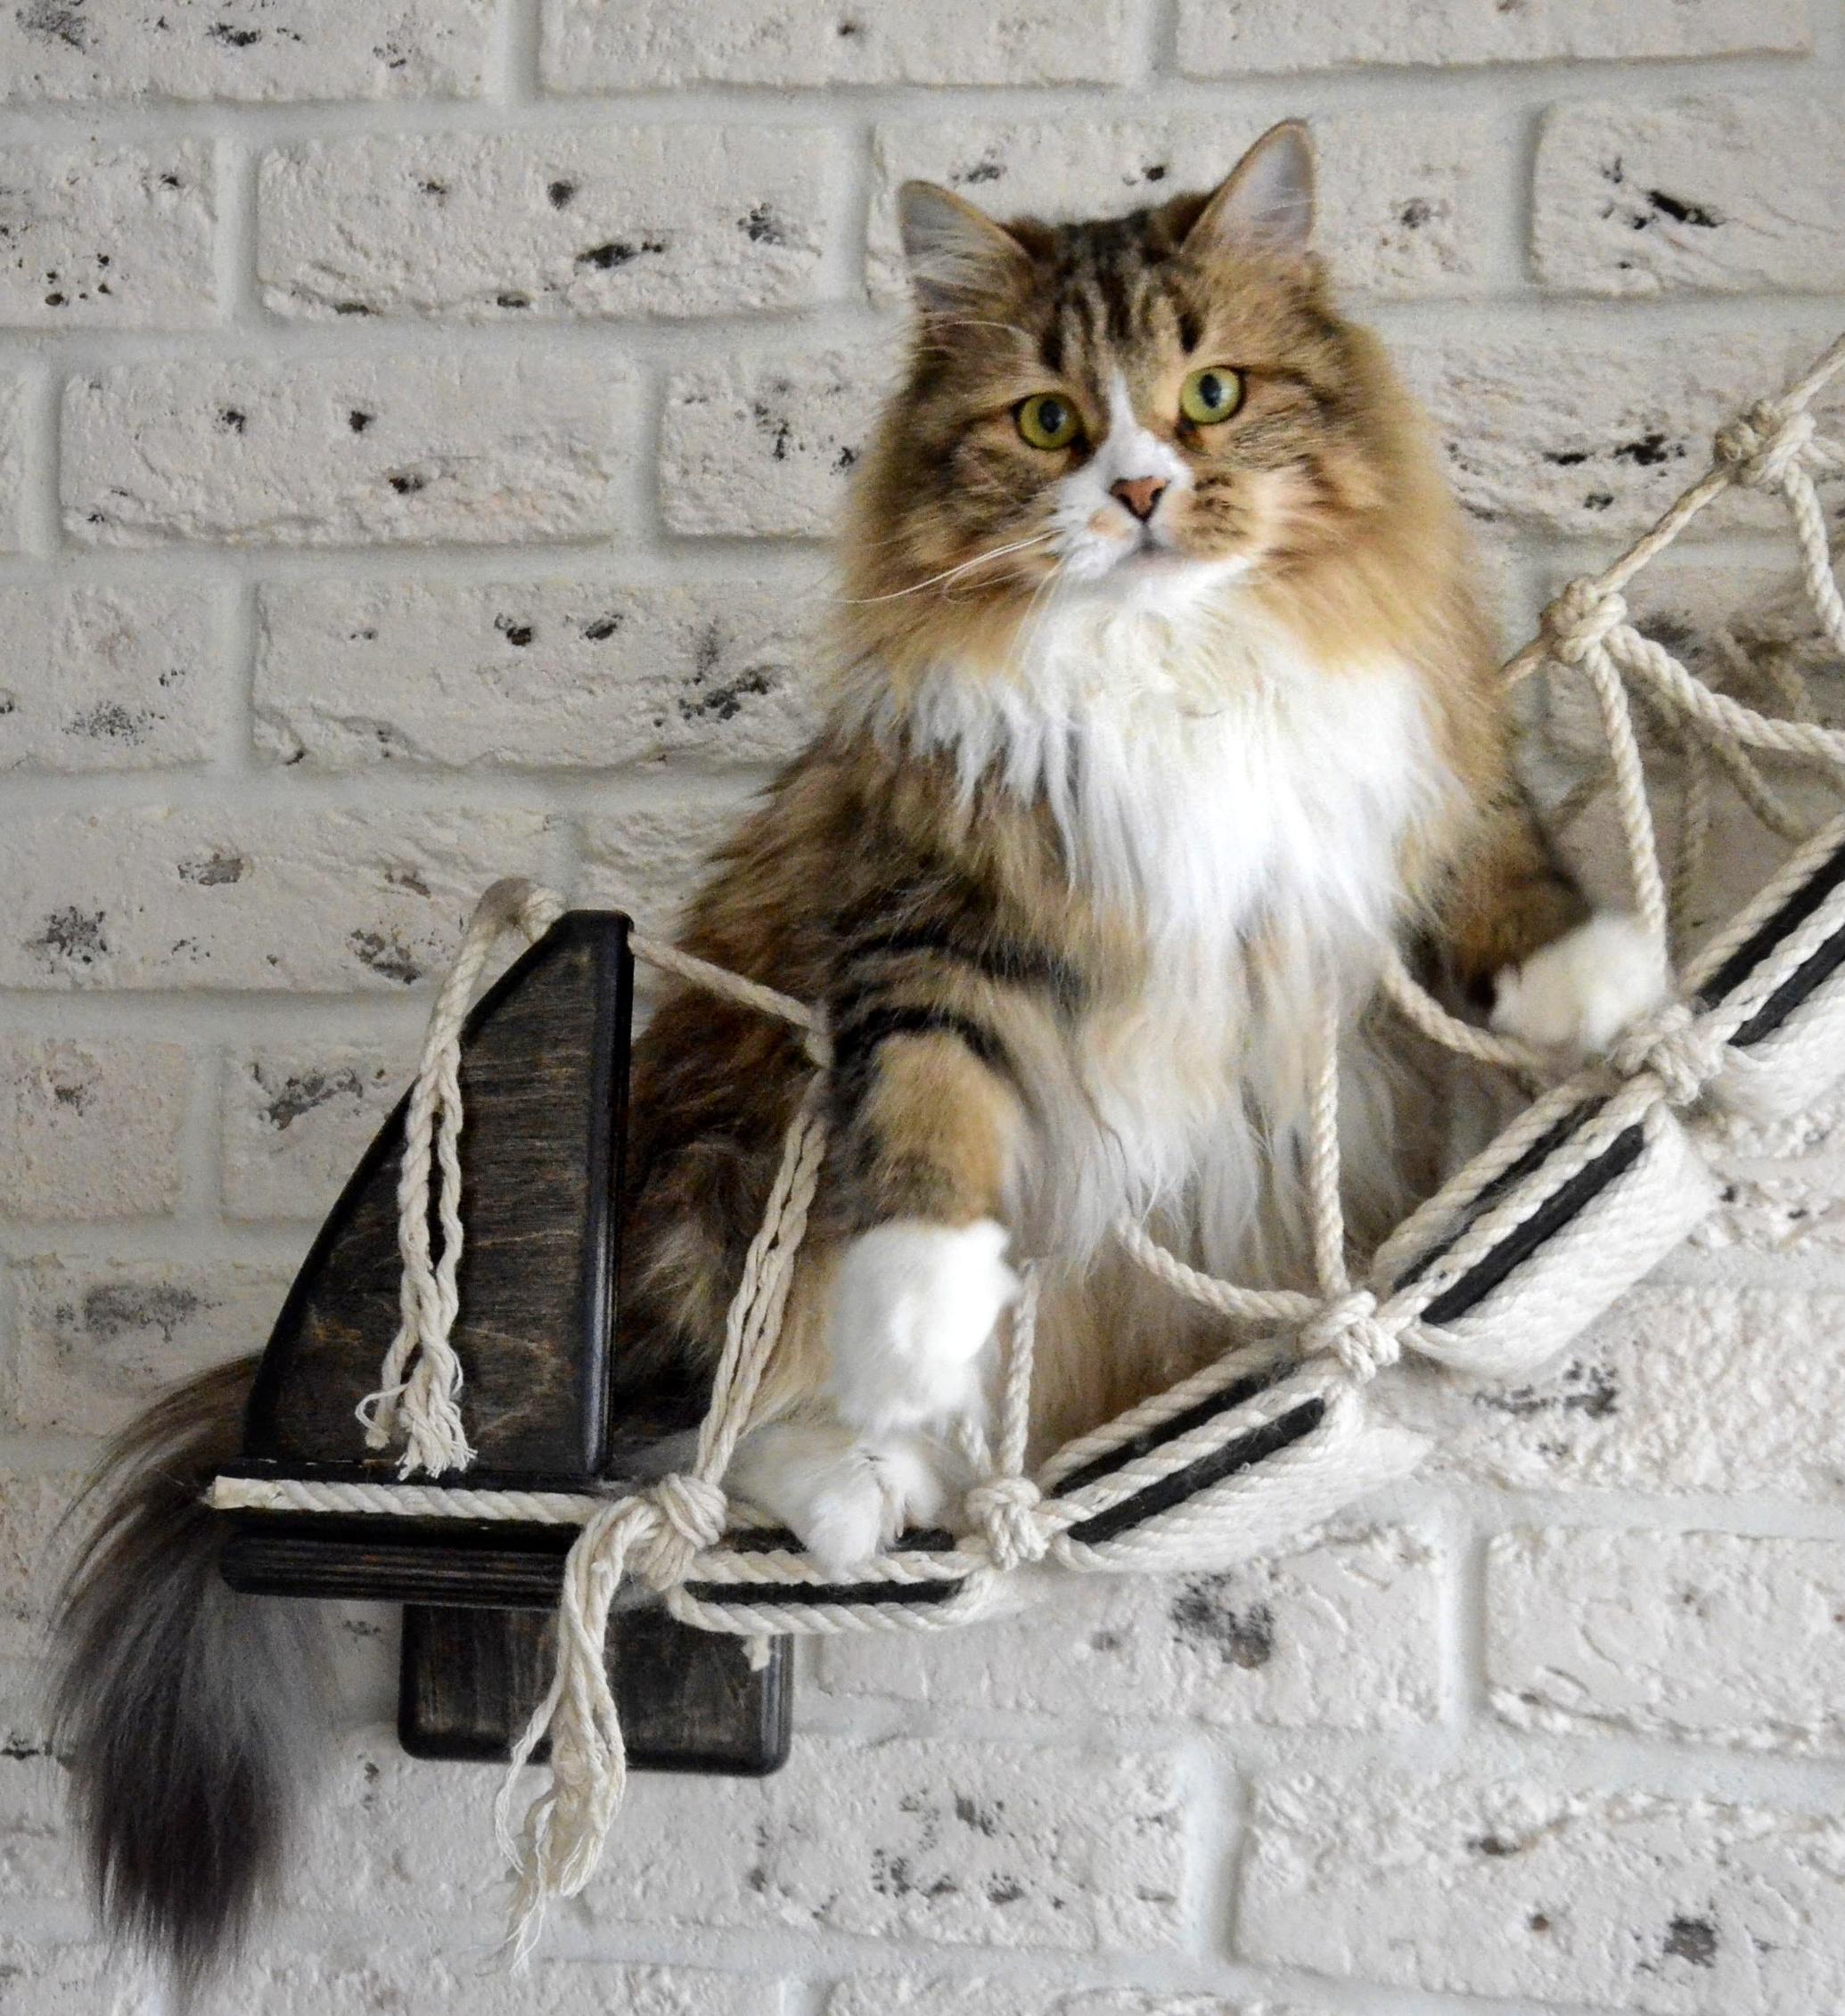 cats07.02.21 144-01